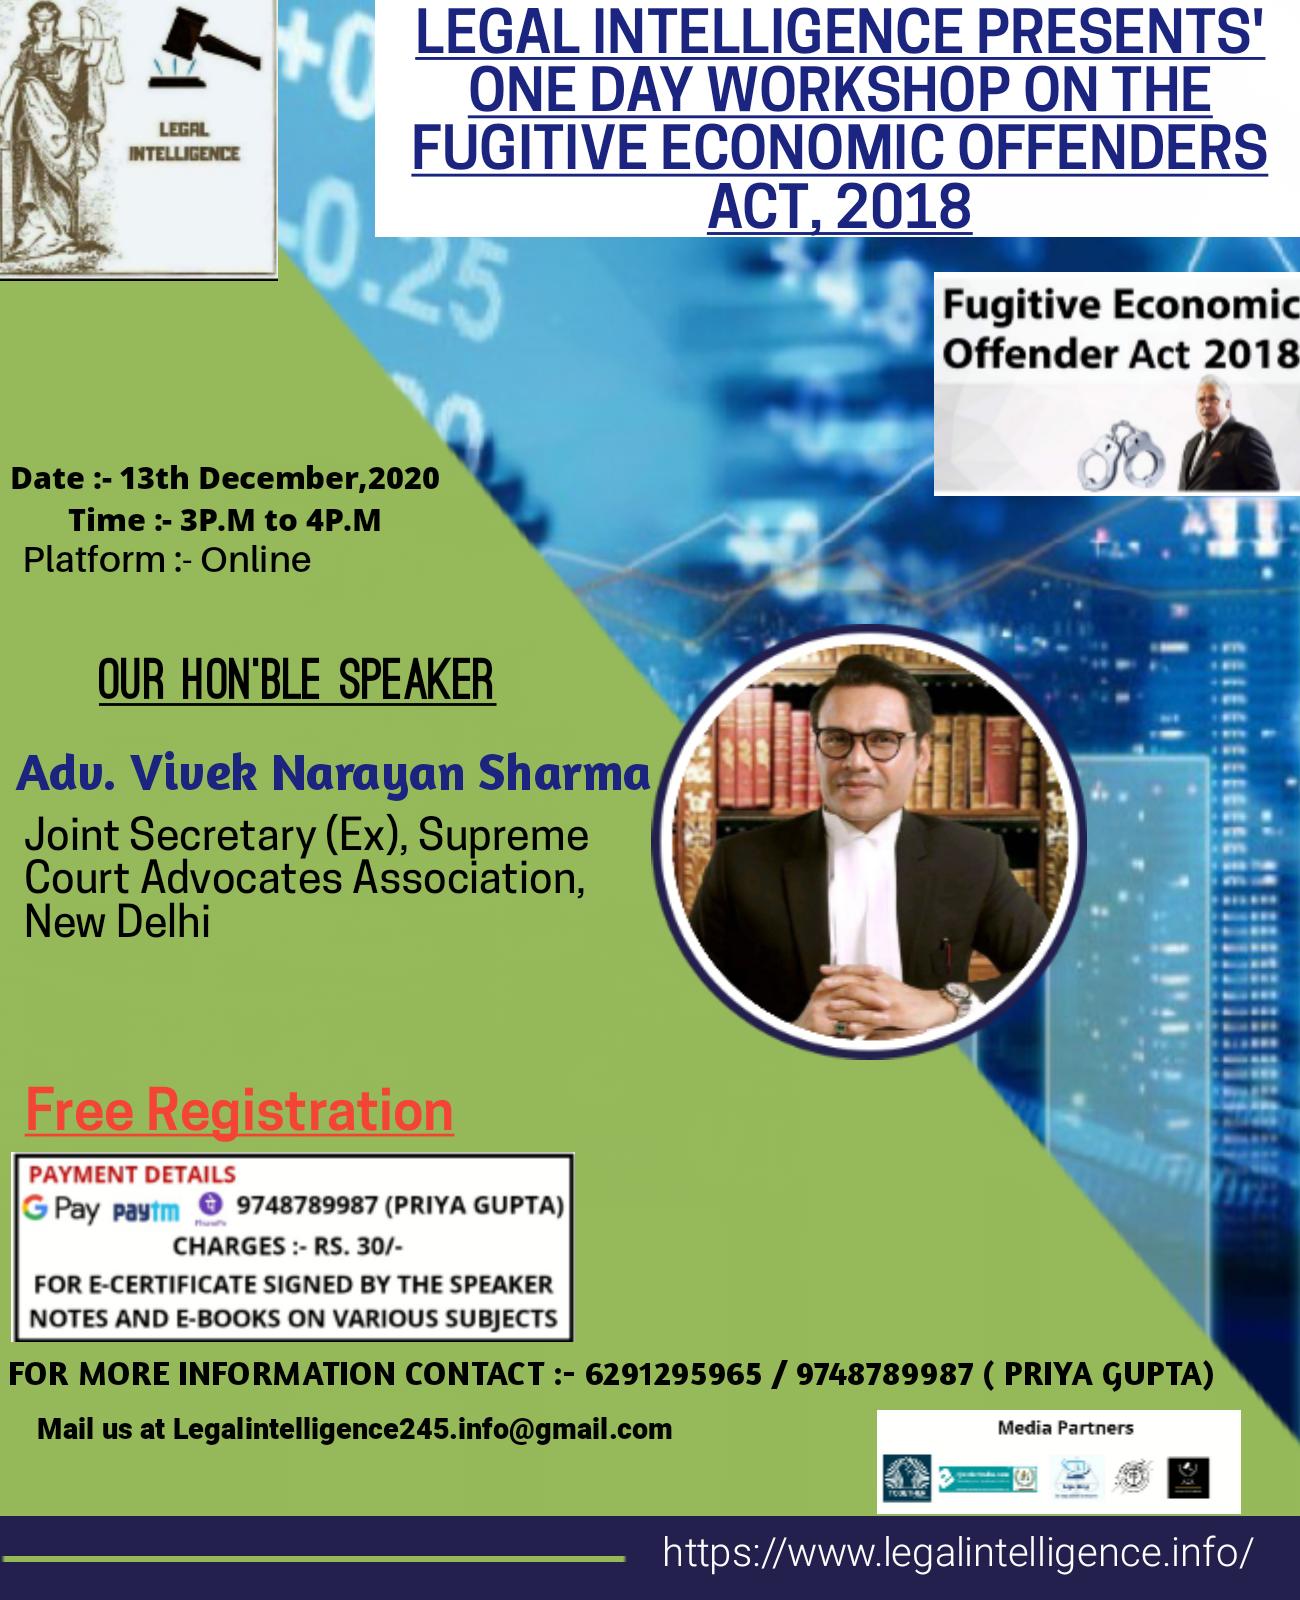 Legal Intelligence is Organizing one day workshop on Fugitive Economic Offenders Act, 2018